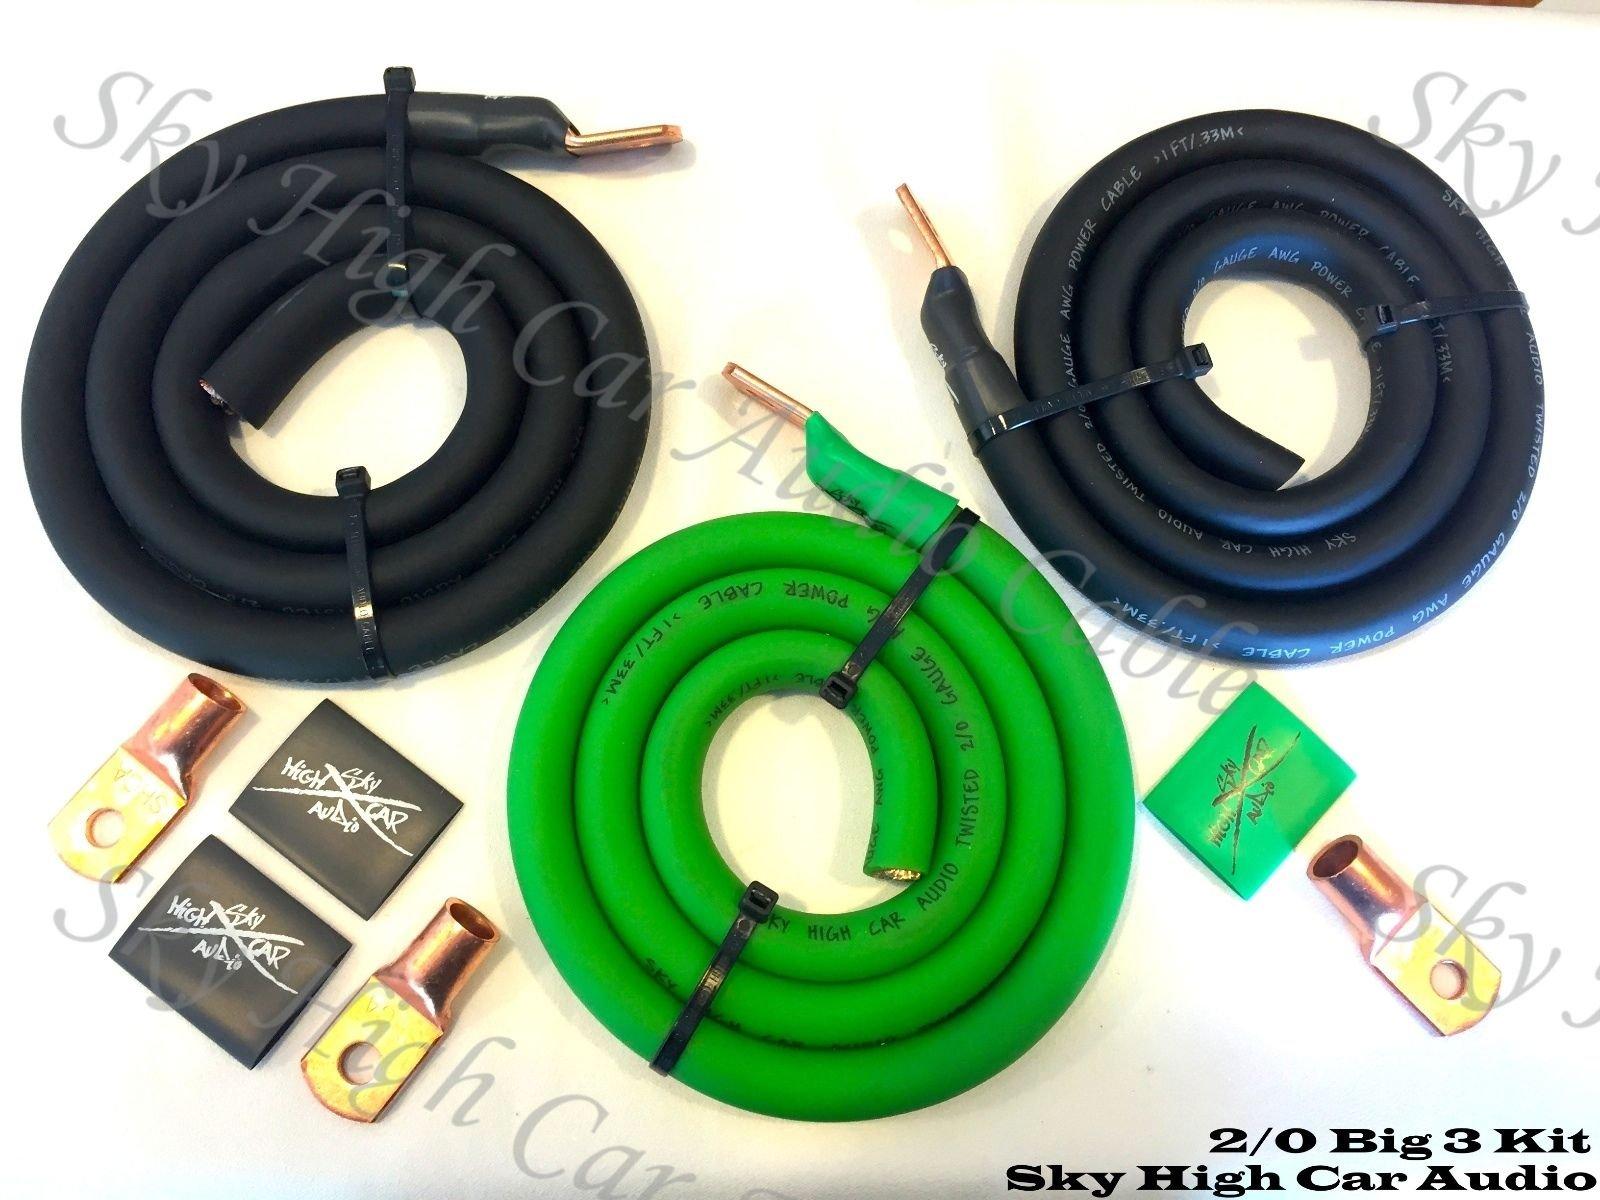 Sky High Oversized 2/0 Gauge AWG Big 3 Upgrade GREEN/BLACK Electrical Wiring Kit